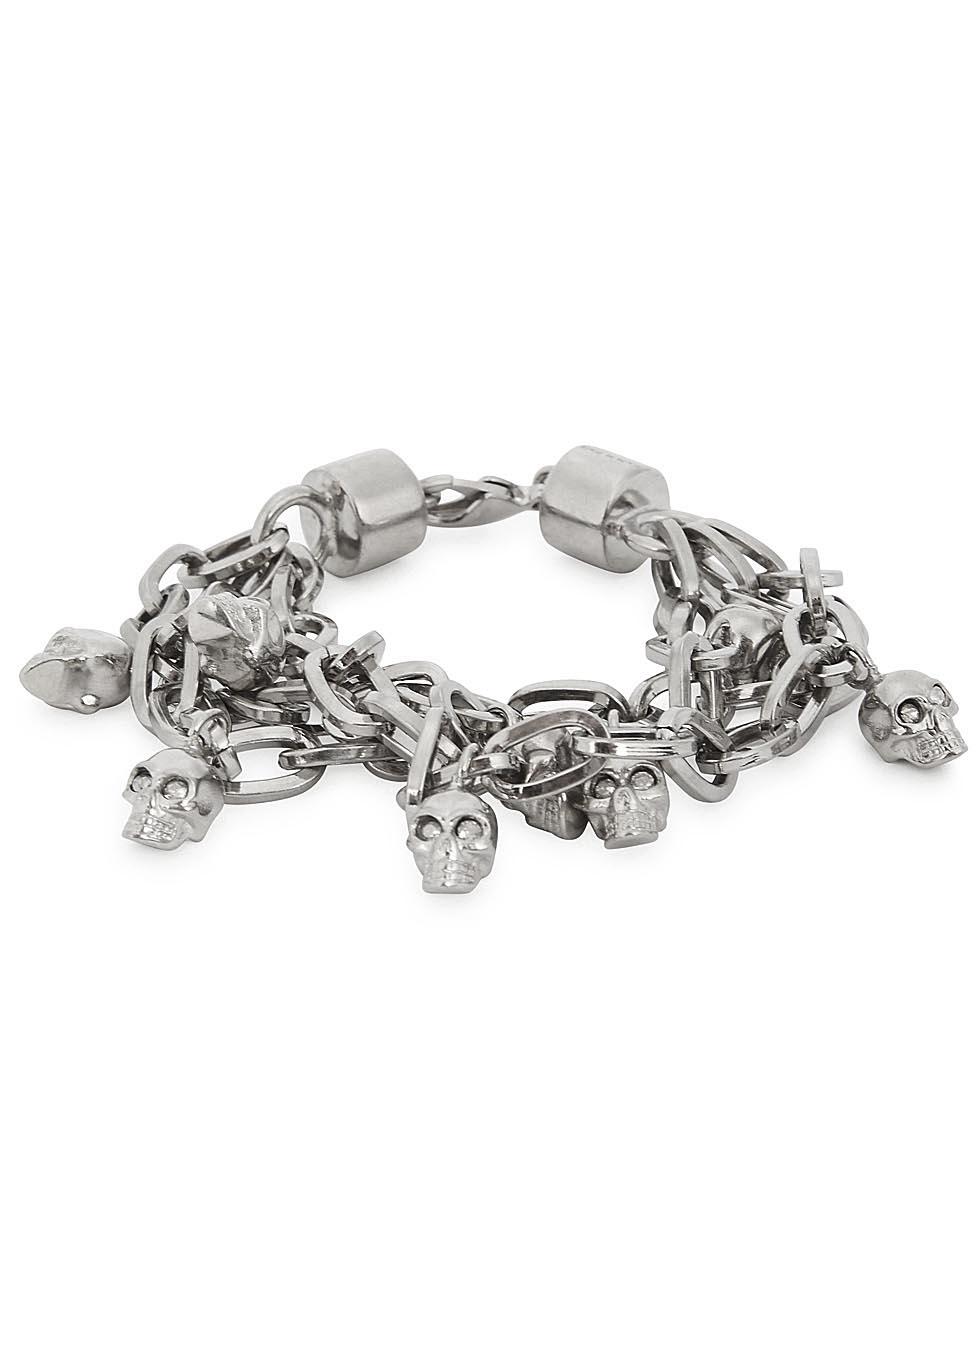 Alexander McQueen Silver-tone Chain Bracelet - Silver 7I6H5Bgp